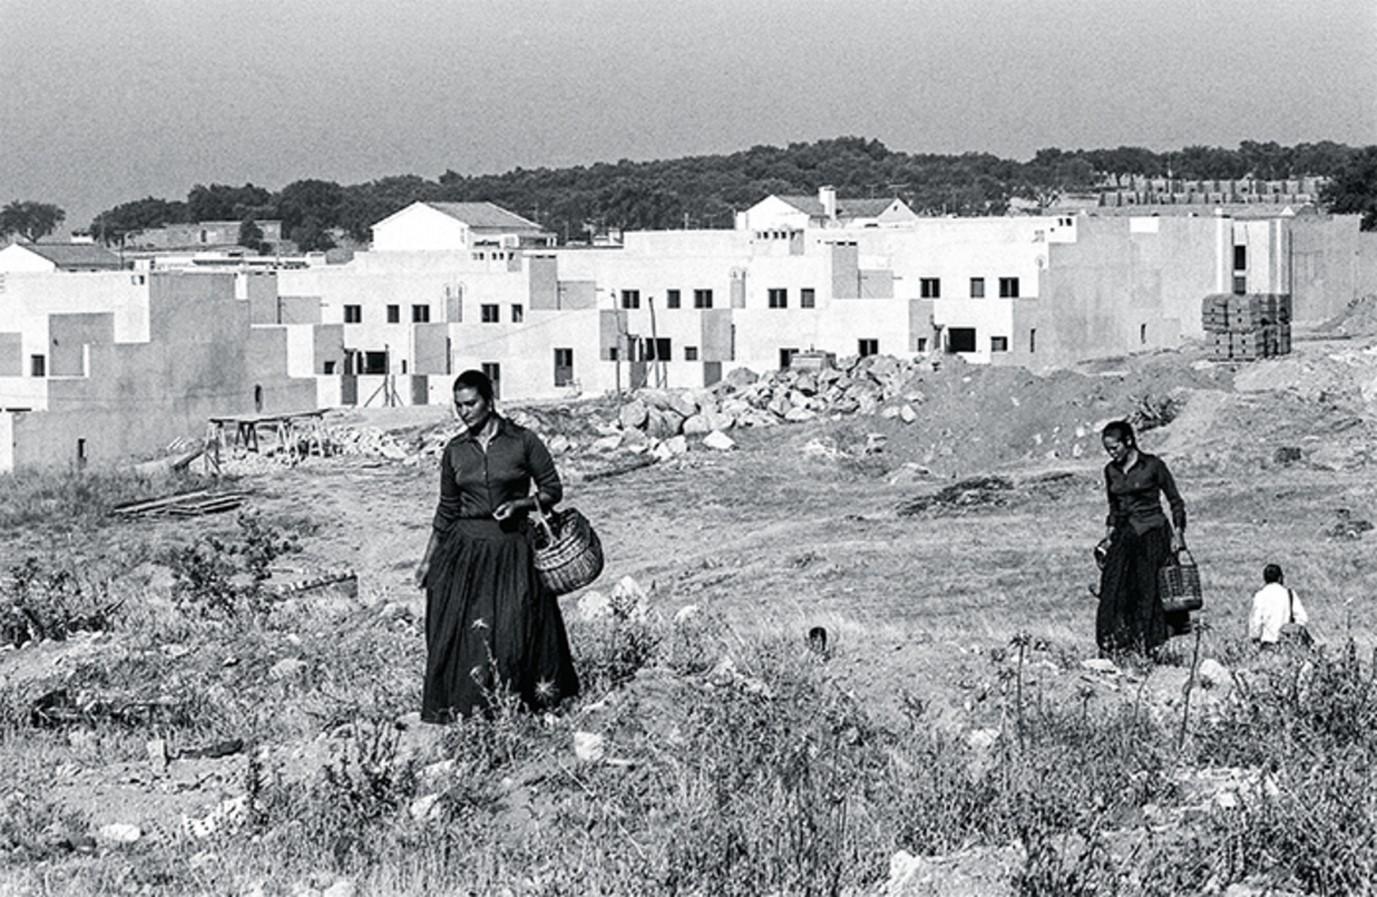 The Malagueira Housing Project, Alvaro Siza, 1977 - Sheet3